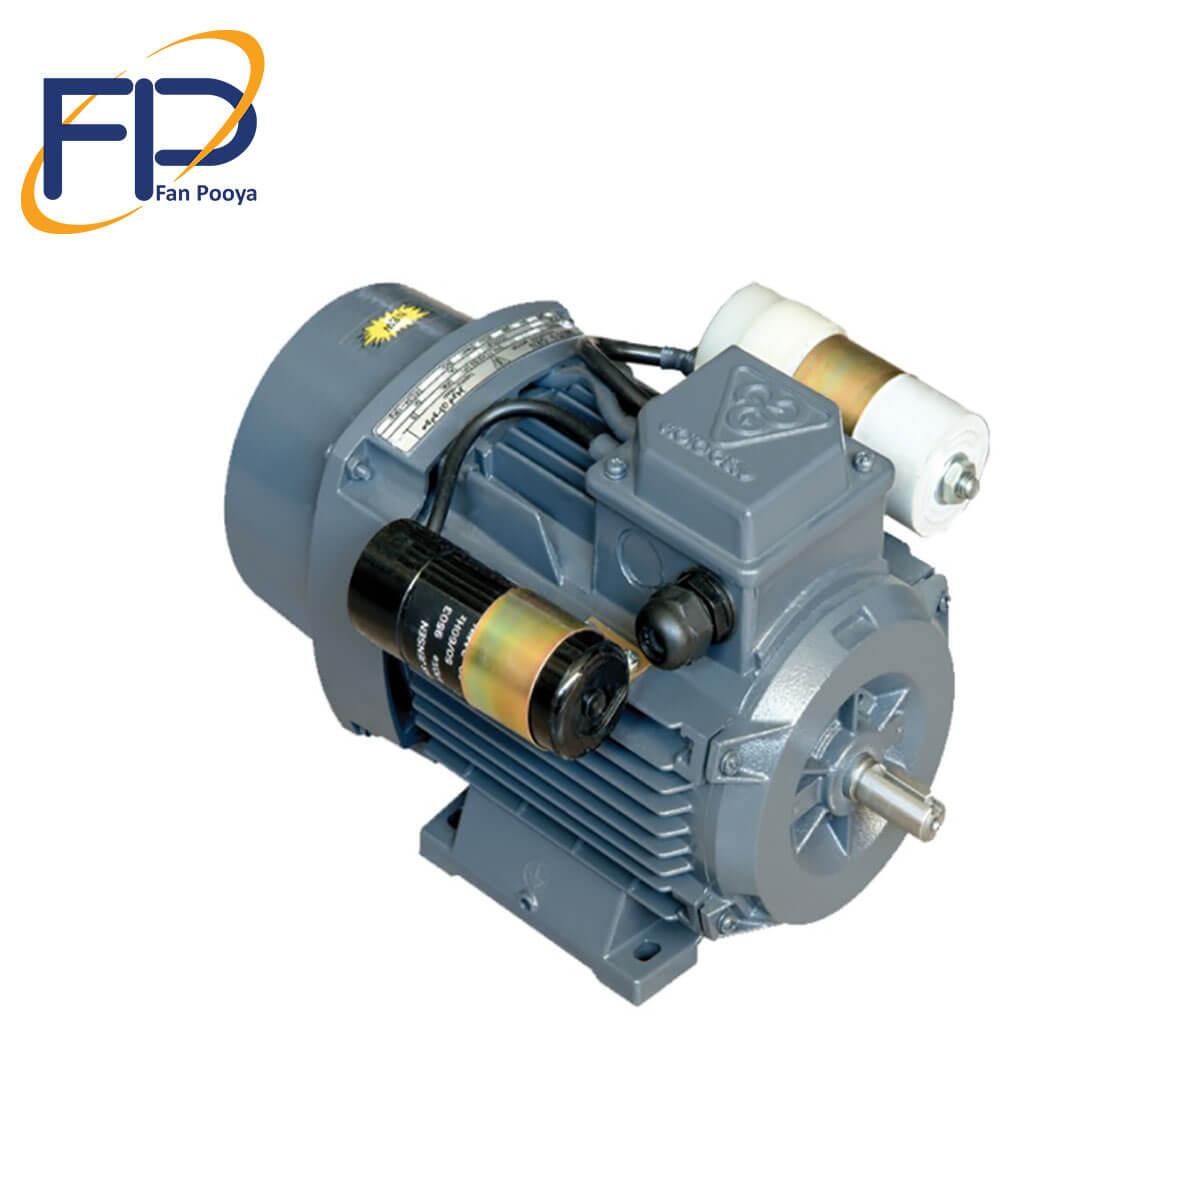 الکتروموتورموتوژن تک فازخازن استارت(CRS)تک دورقدرت1.5kwکیلو وات 1500دور